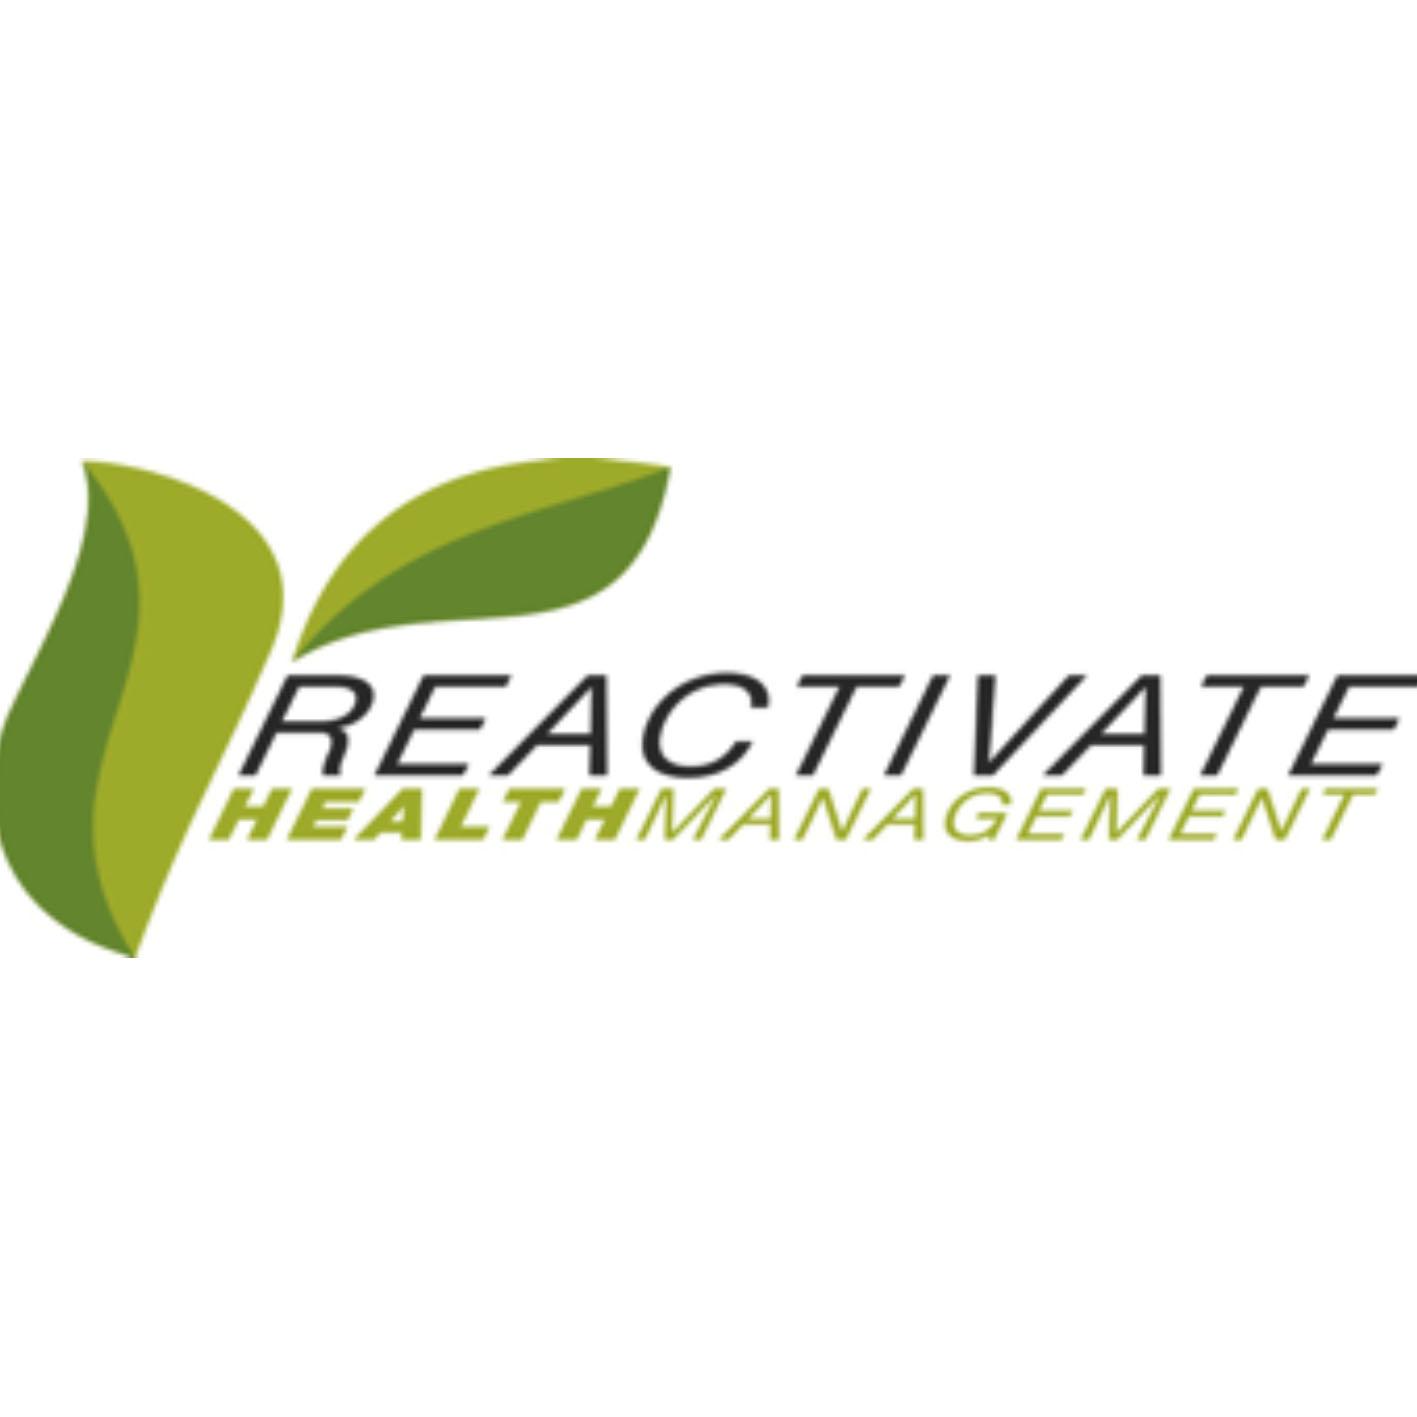 ReActivate Health Management